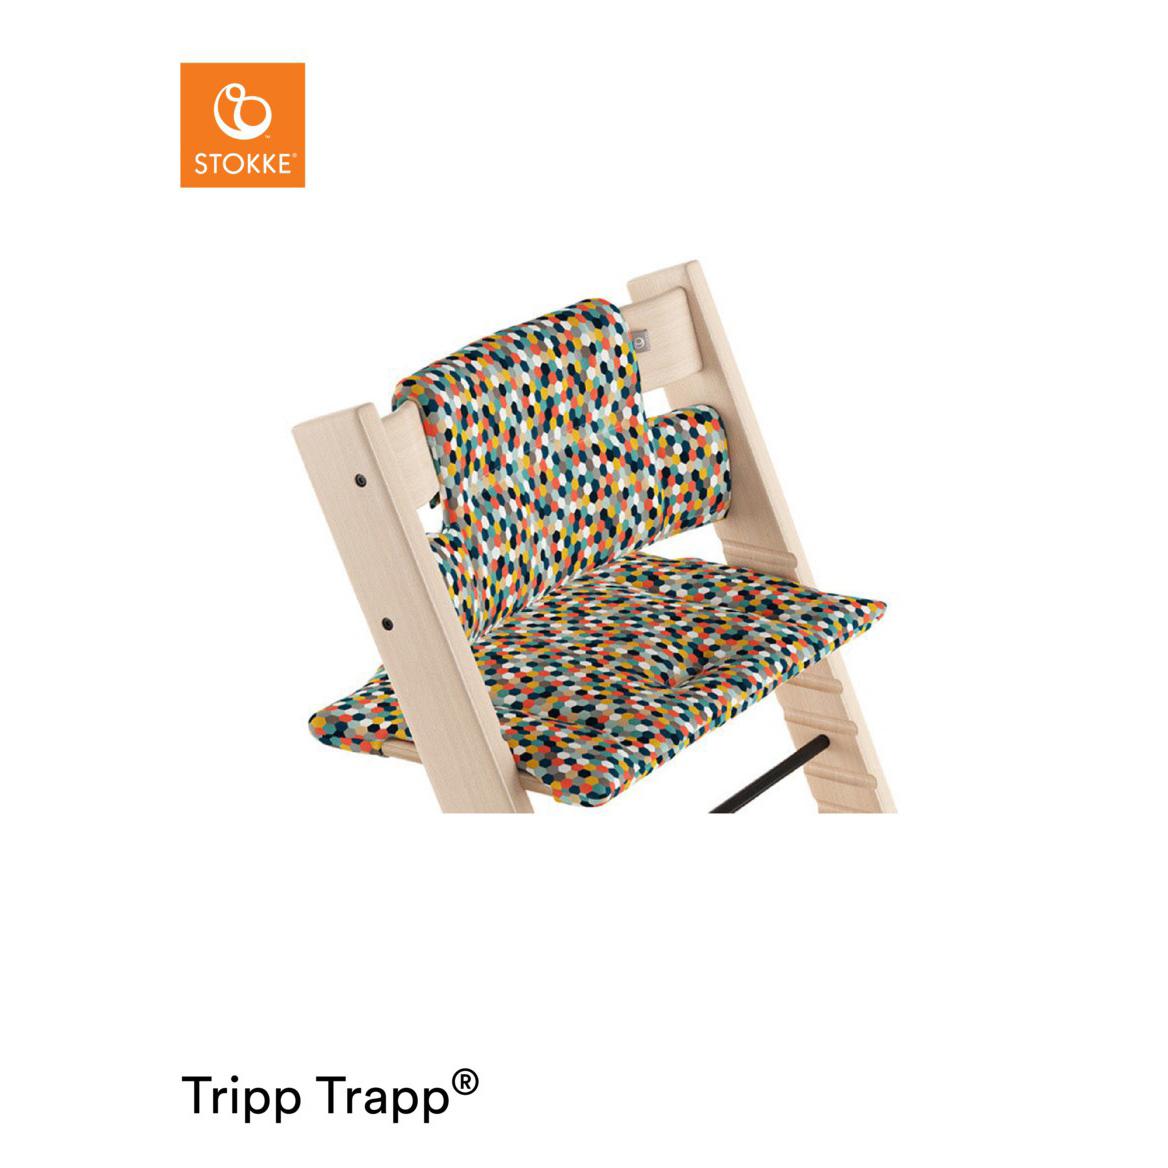 Coussin Classic Tripp Trapp MULTICOLORE Stokke